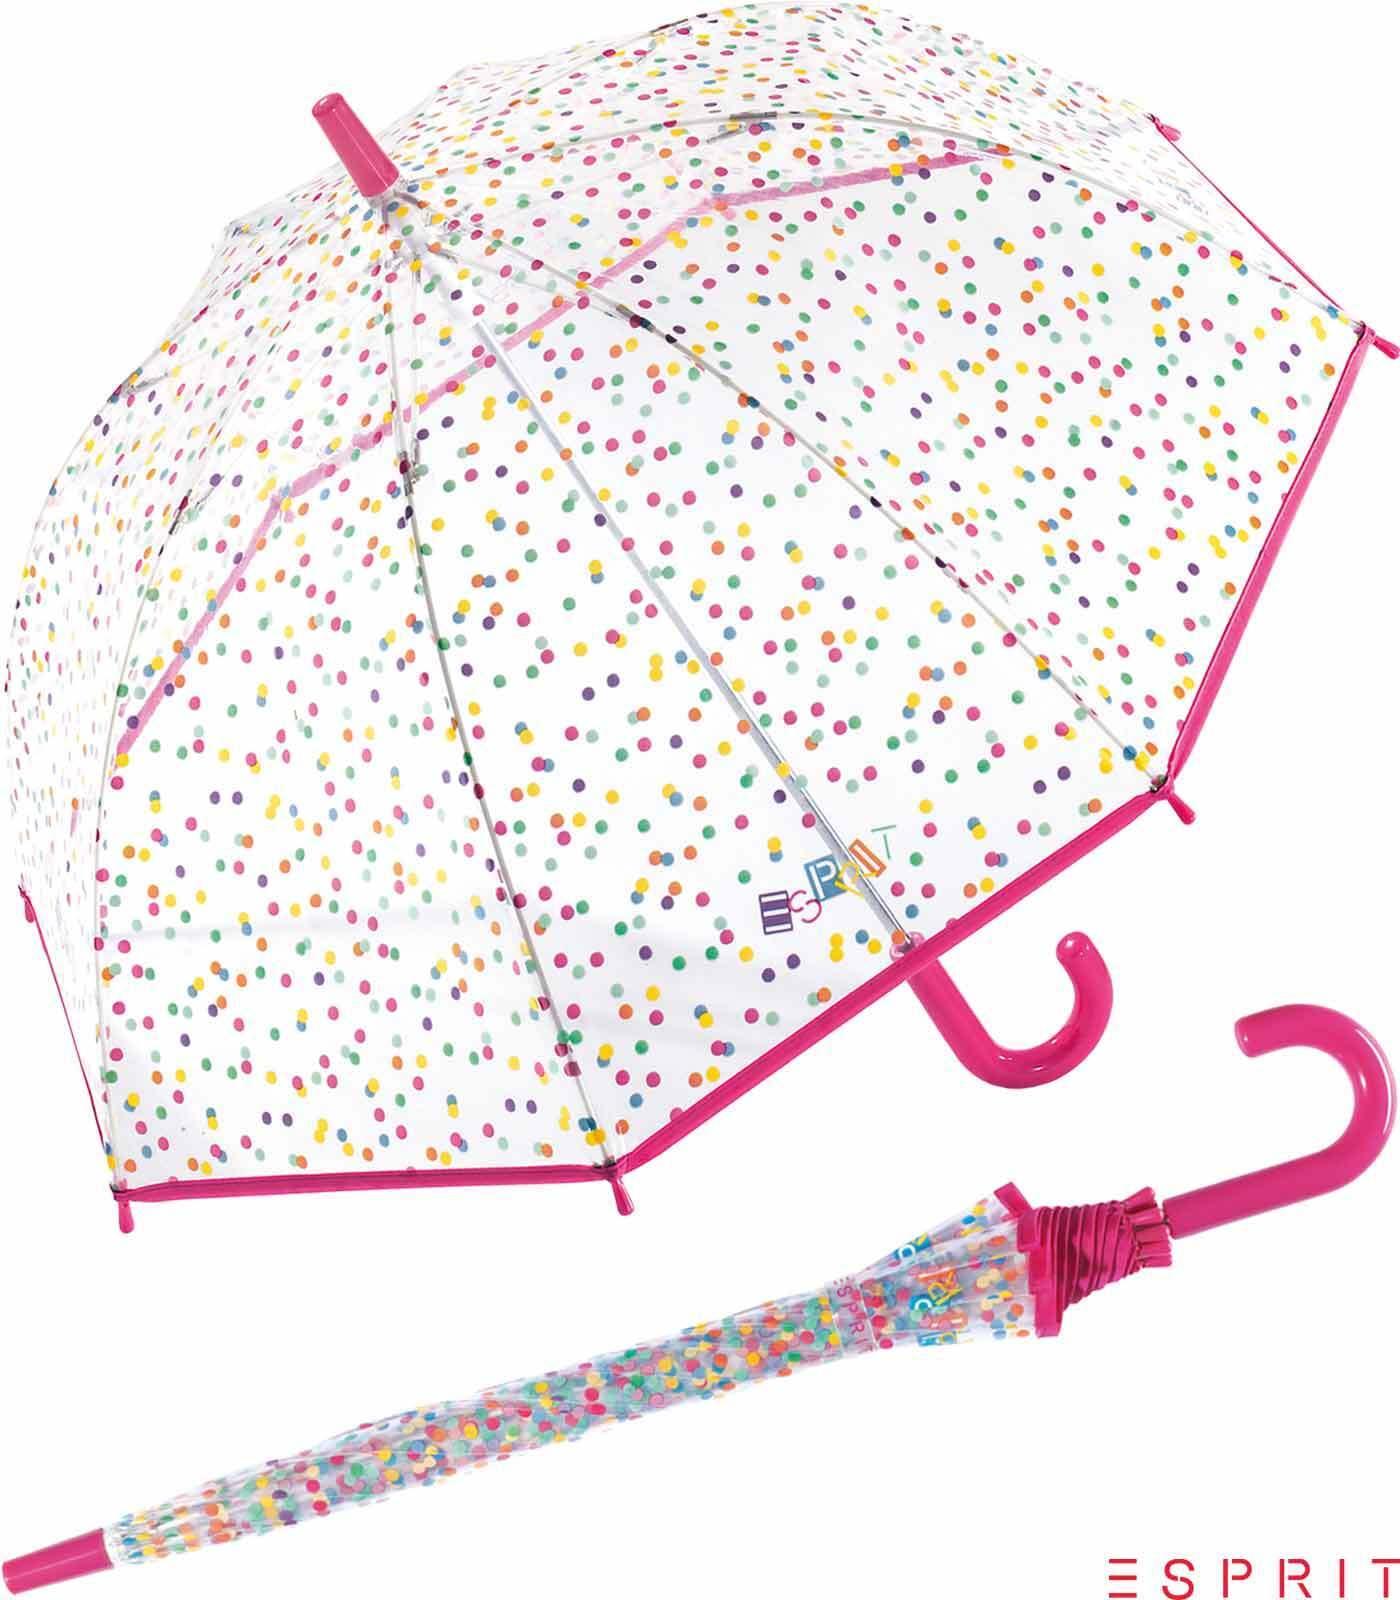 Esprit Kinder Regenschirm Stockschirm leicht stabil transparent colored dots